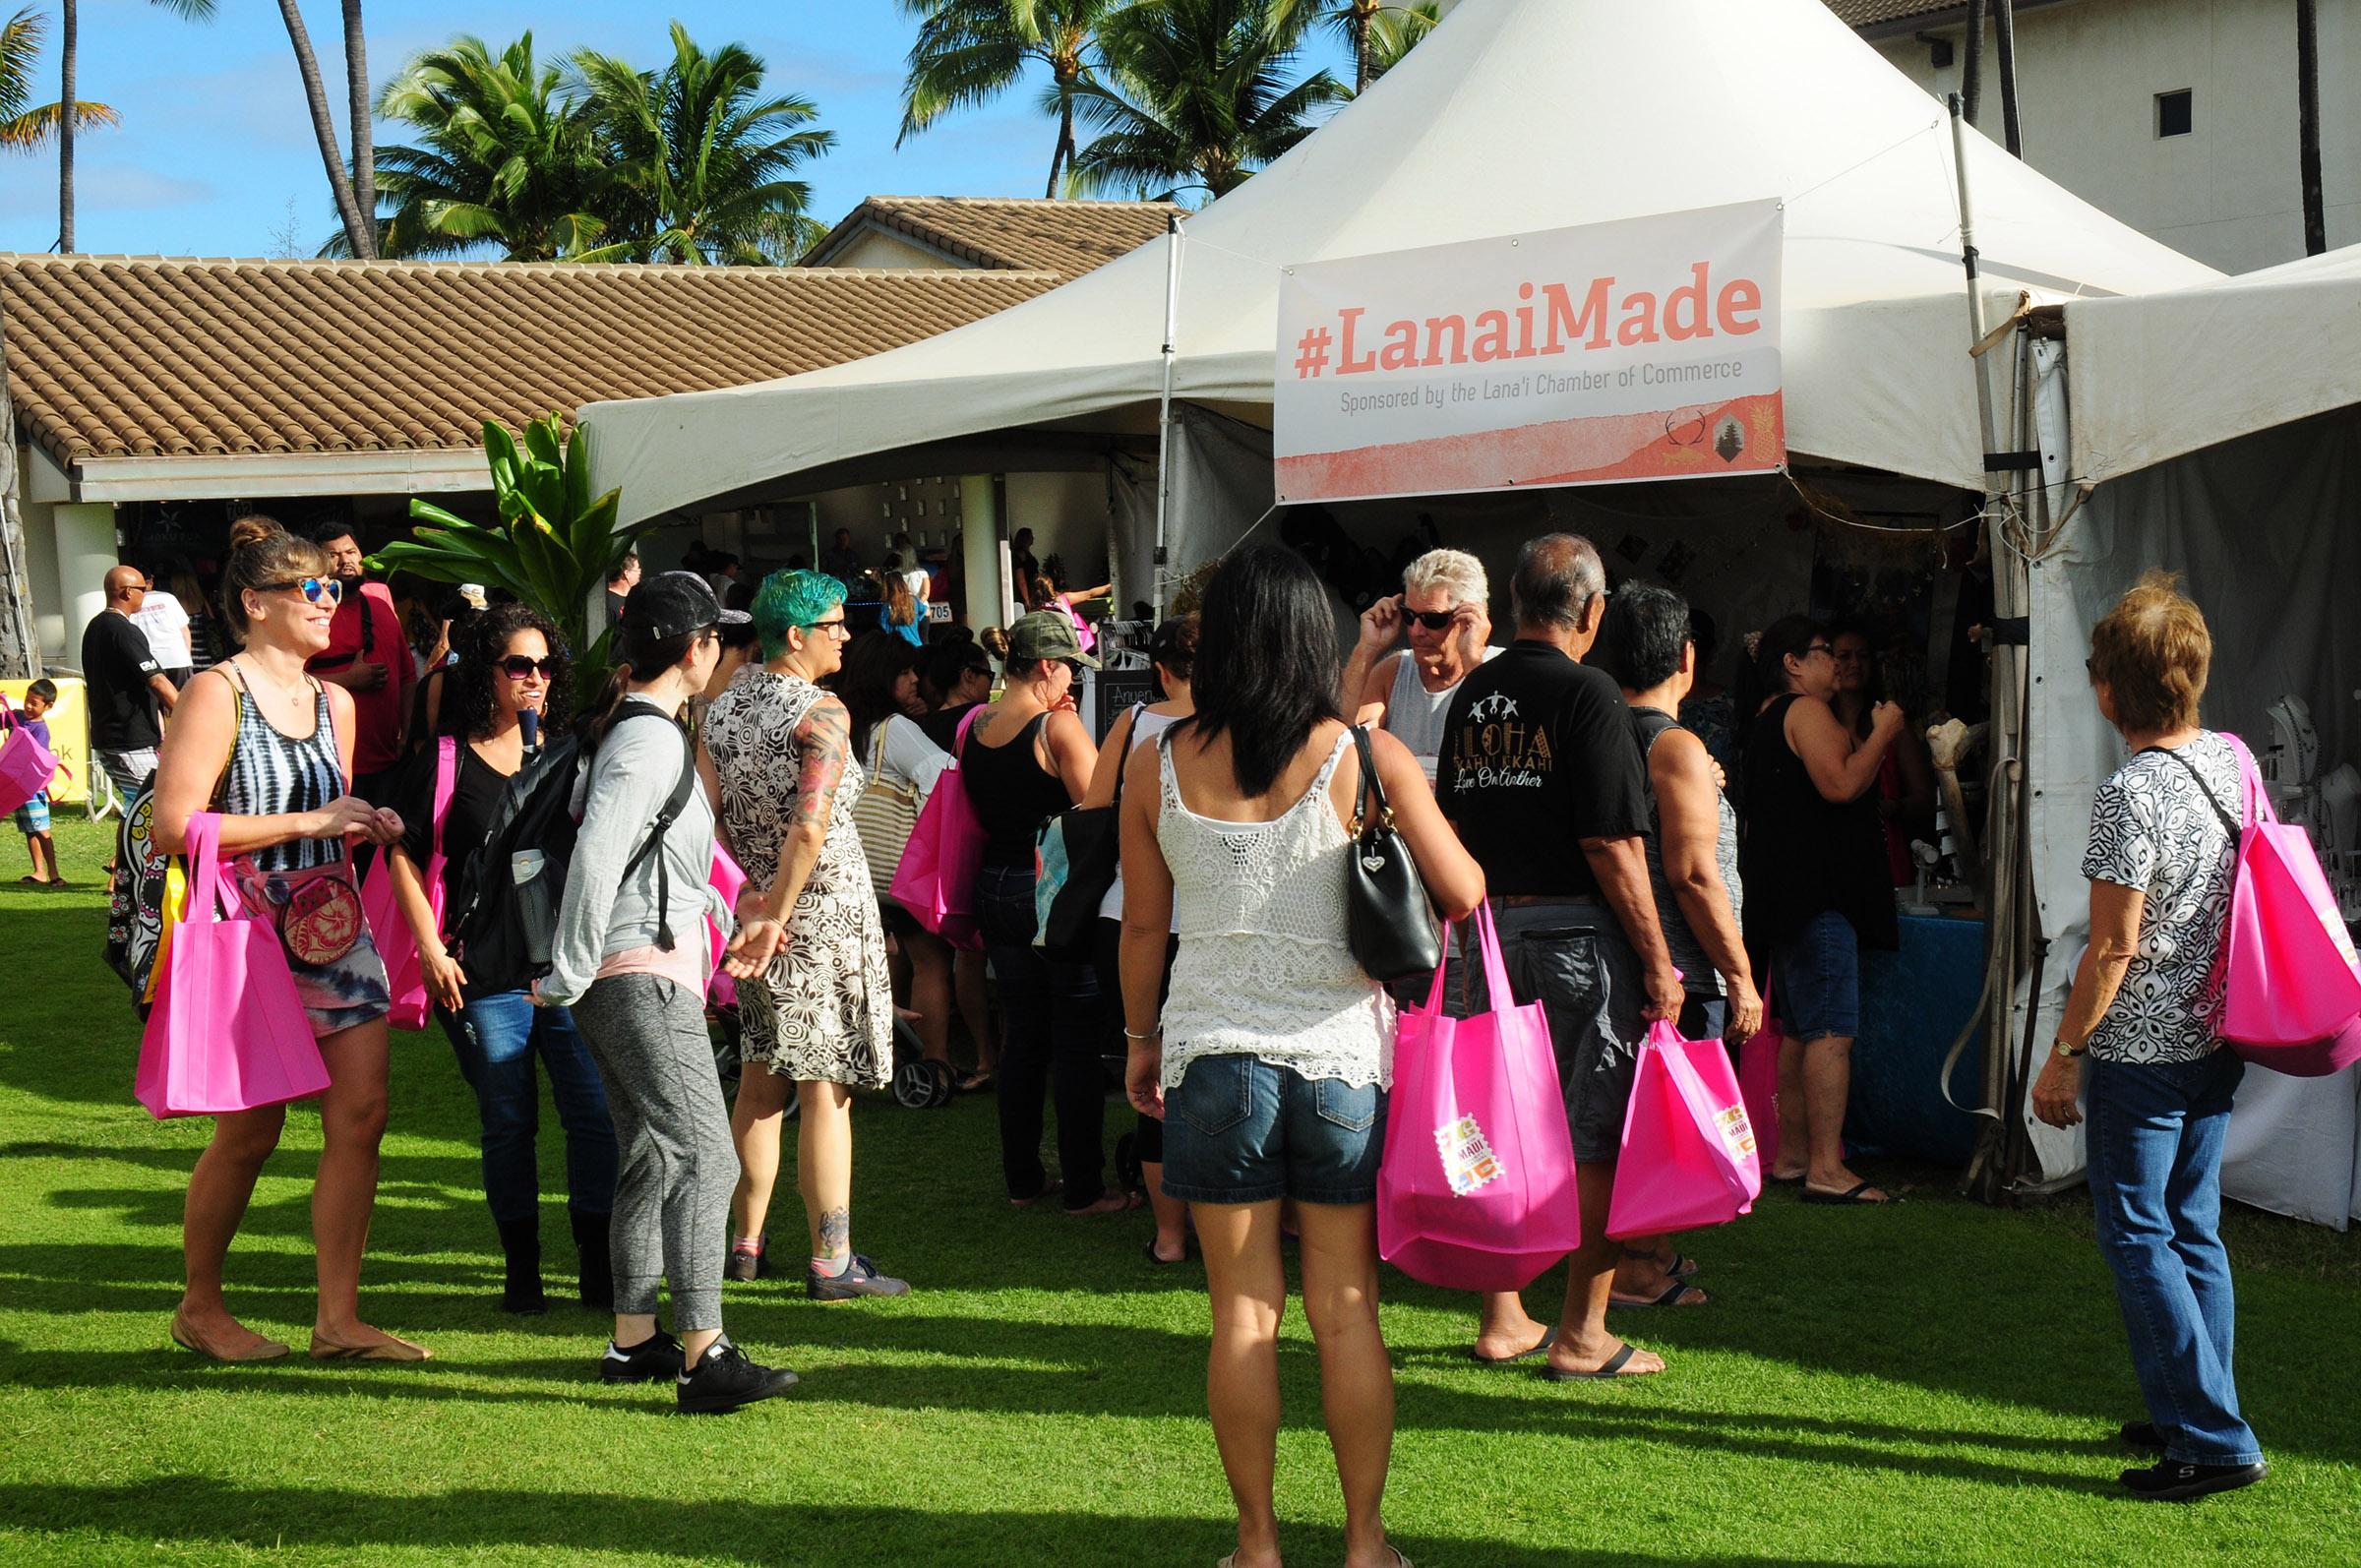 Maui Now : 5th Annual Made in Maui County Festival, Vendor ... - photo #4